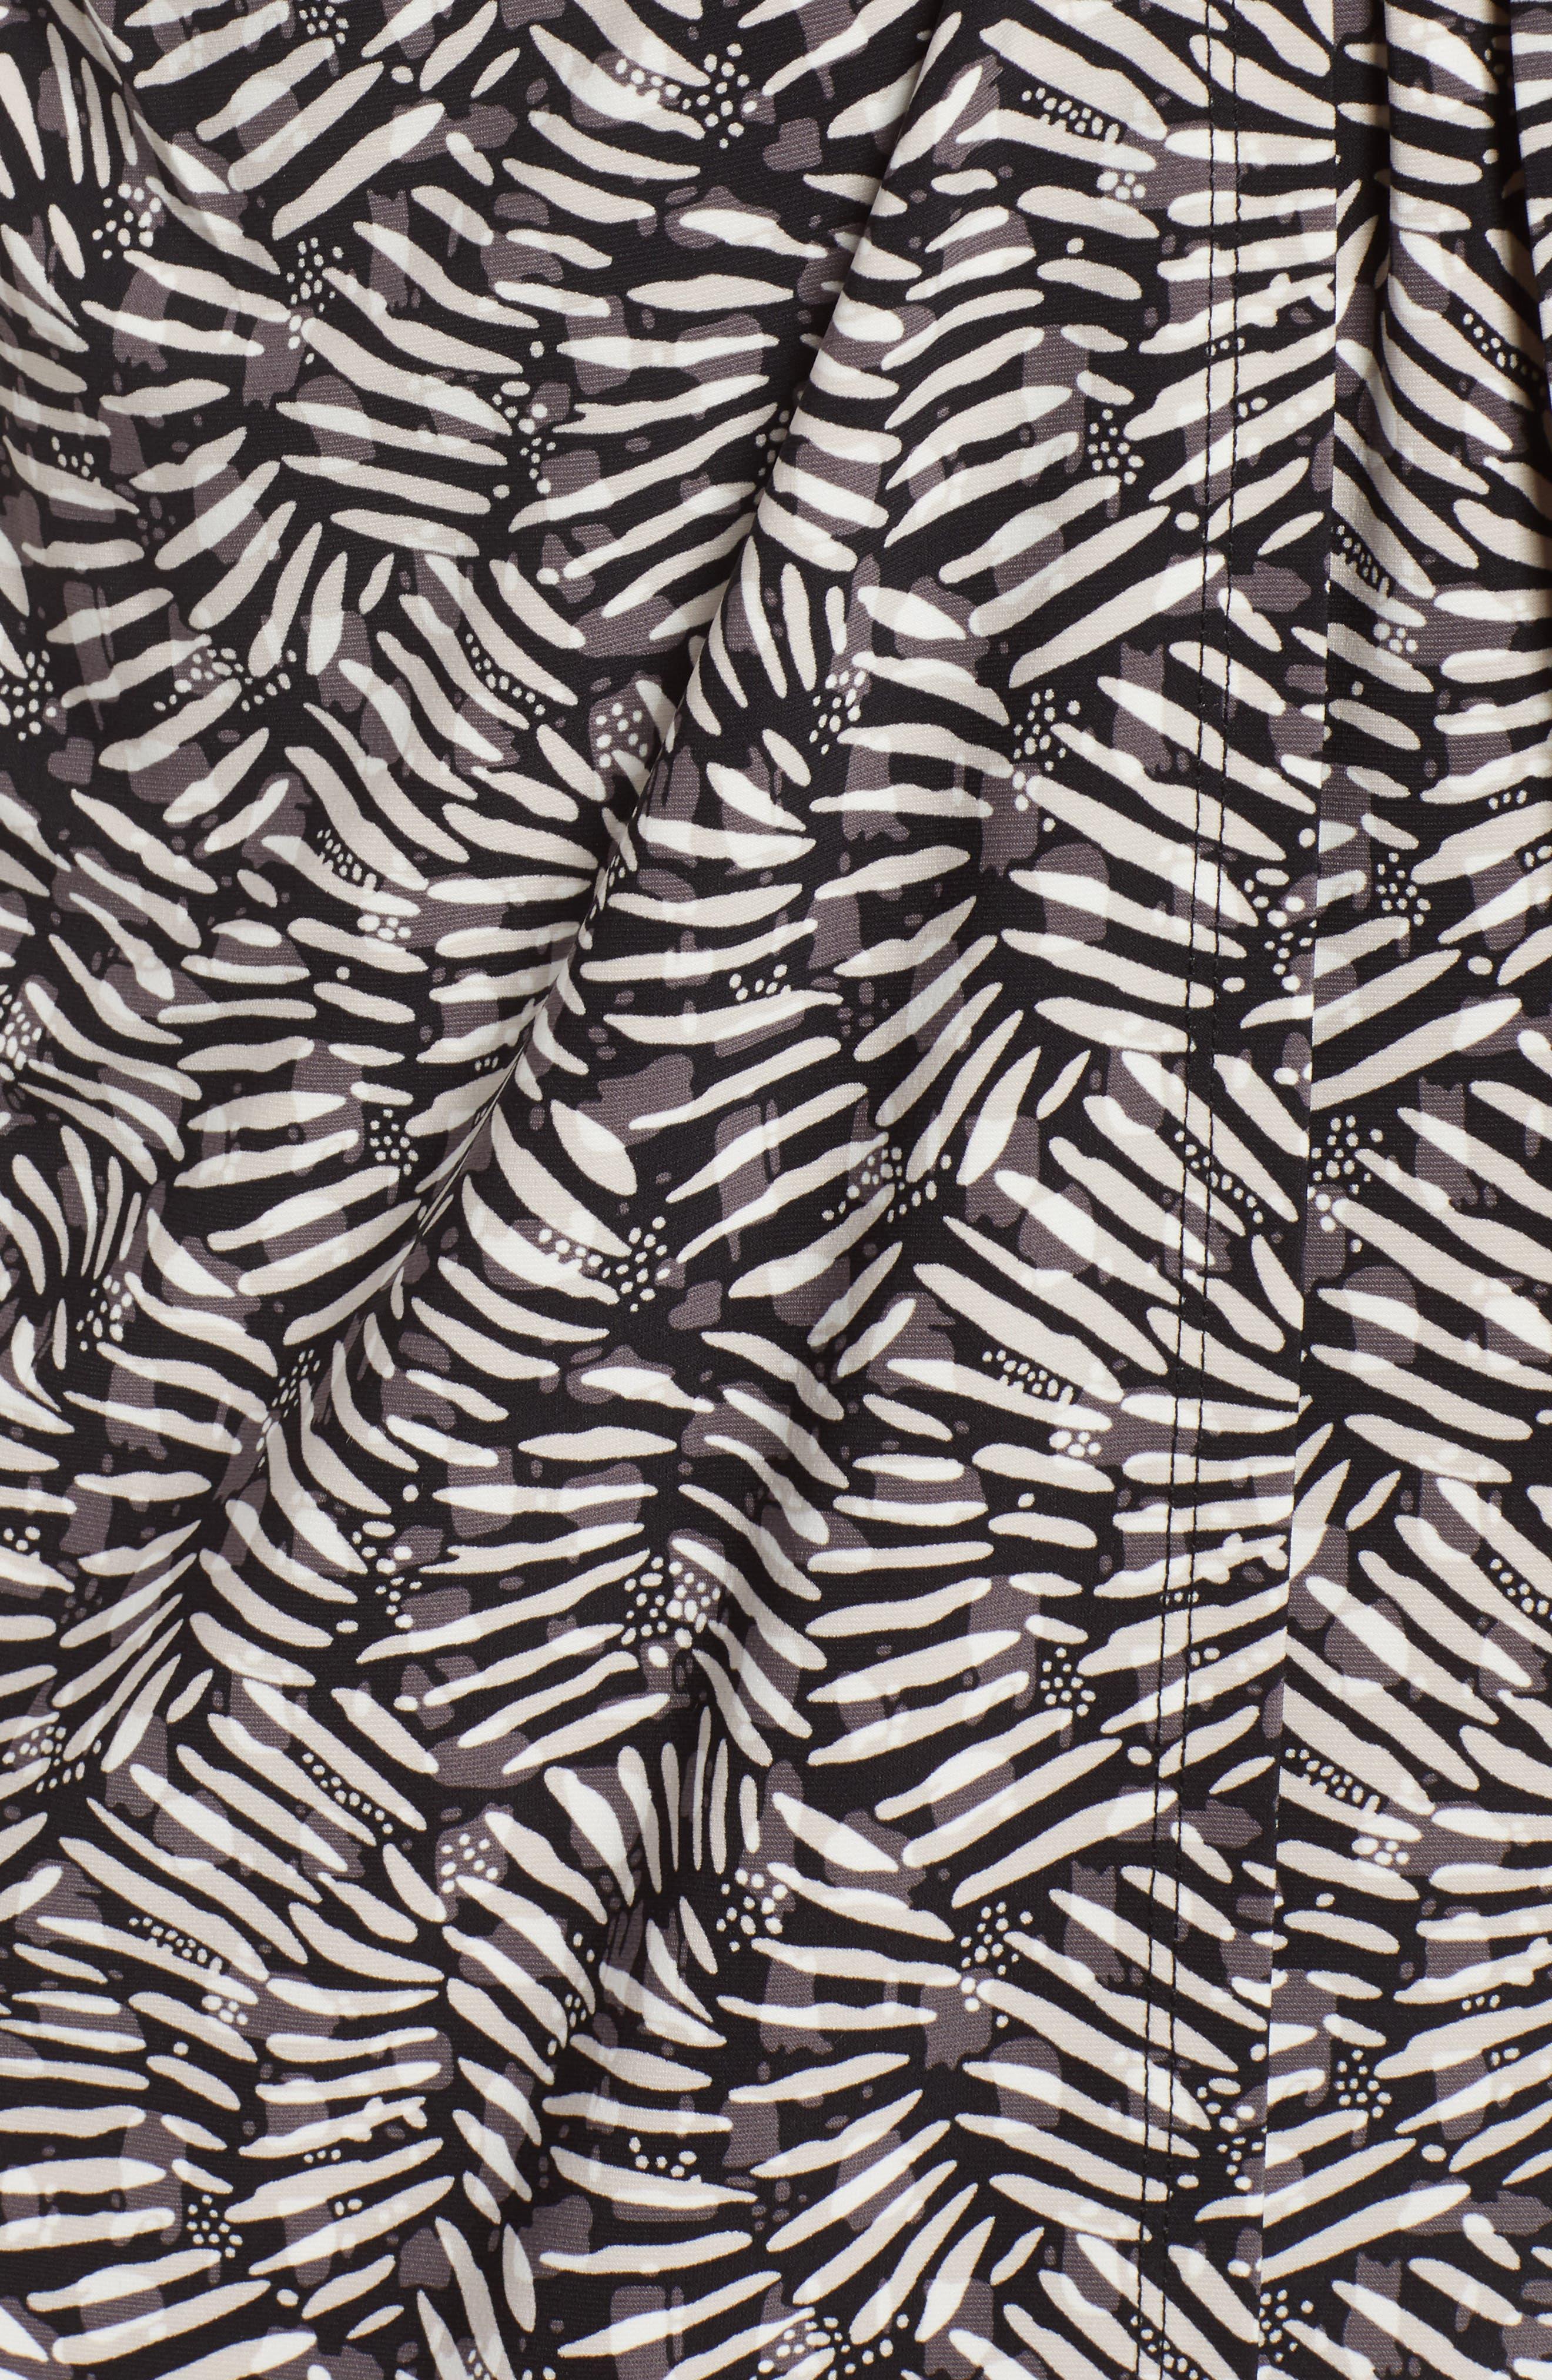 Cedarwood Stretch Crepe Faux Wrap Dress,                             Alternate thumbnail 5, color,                             Black/ Oyster Shell Combo